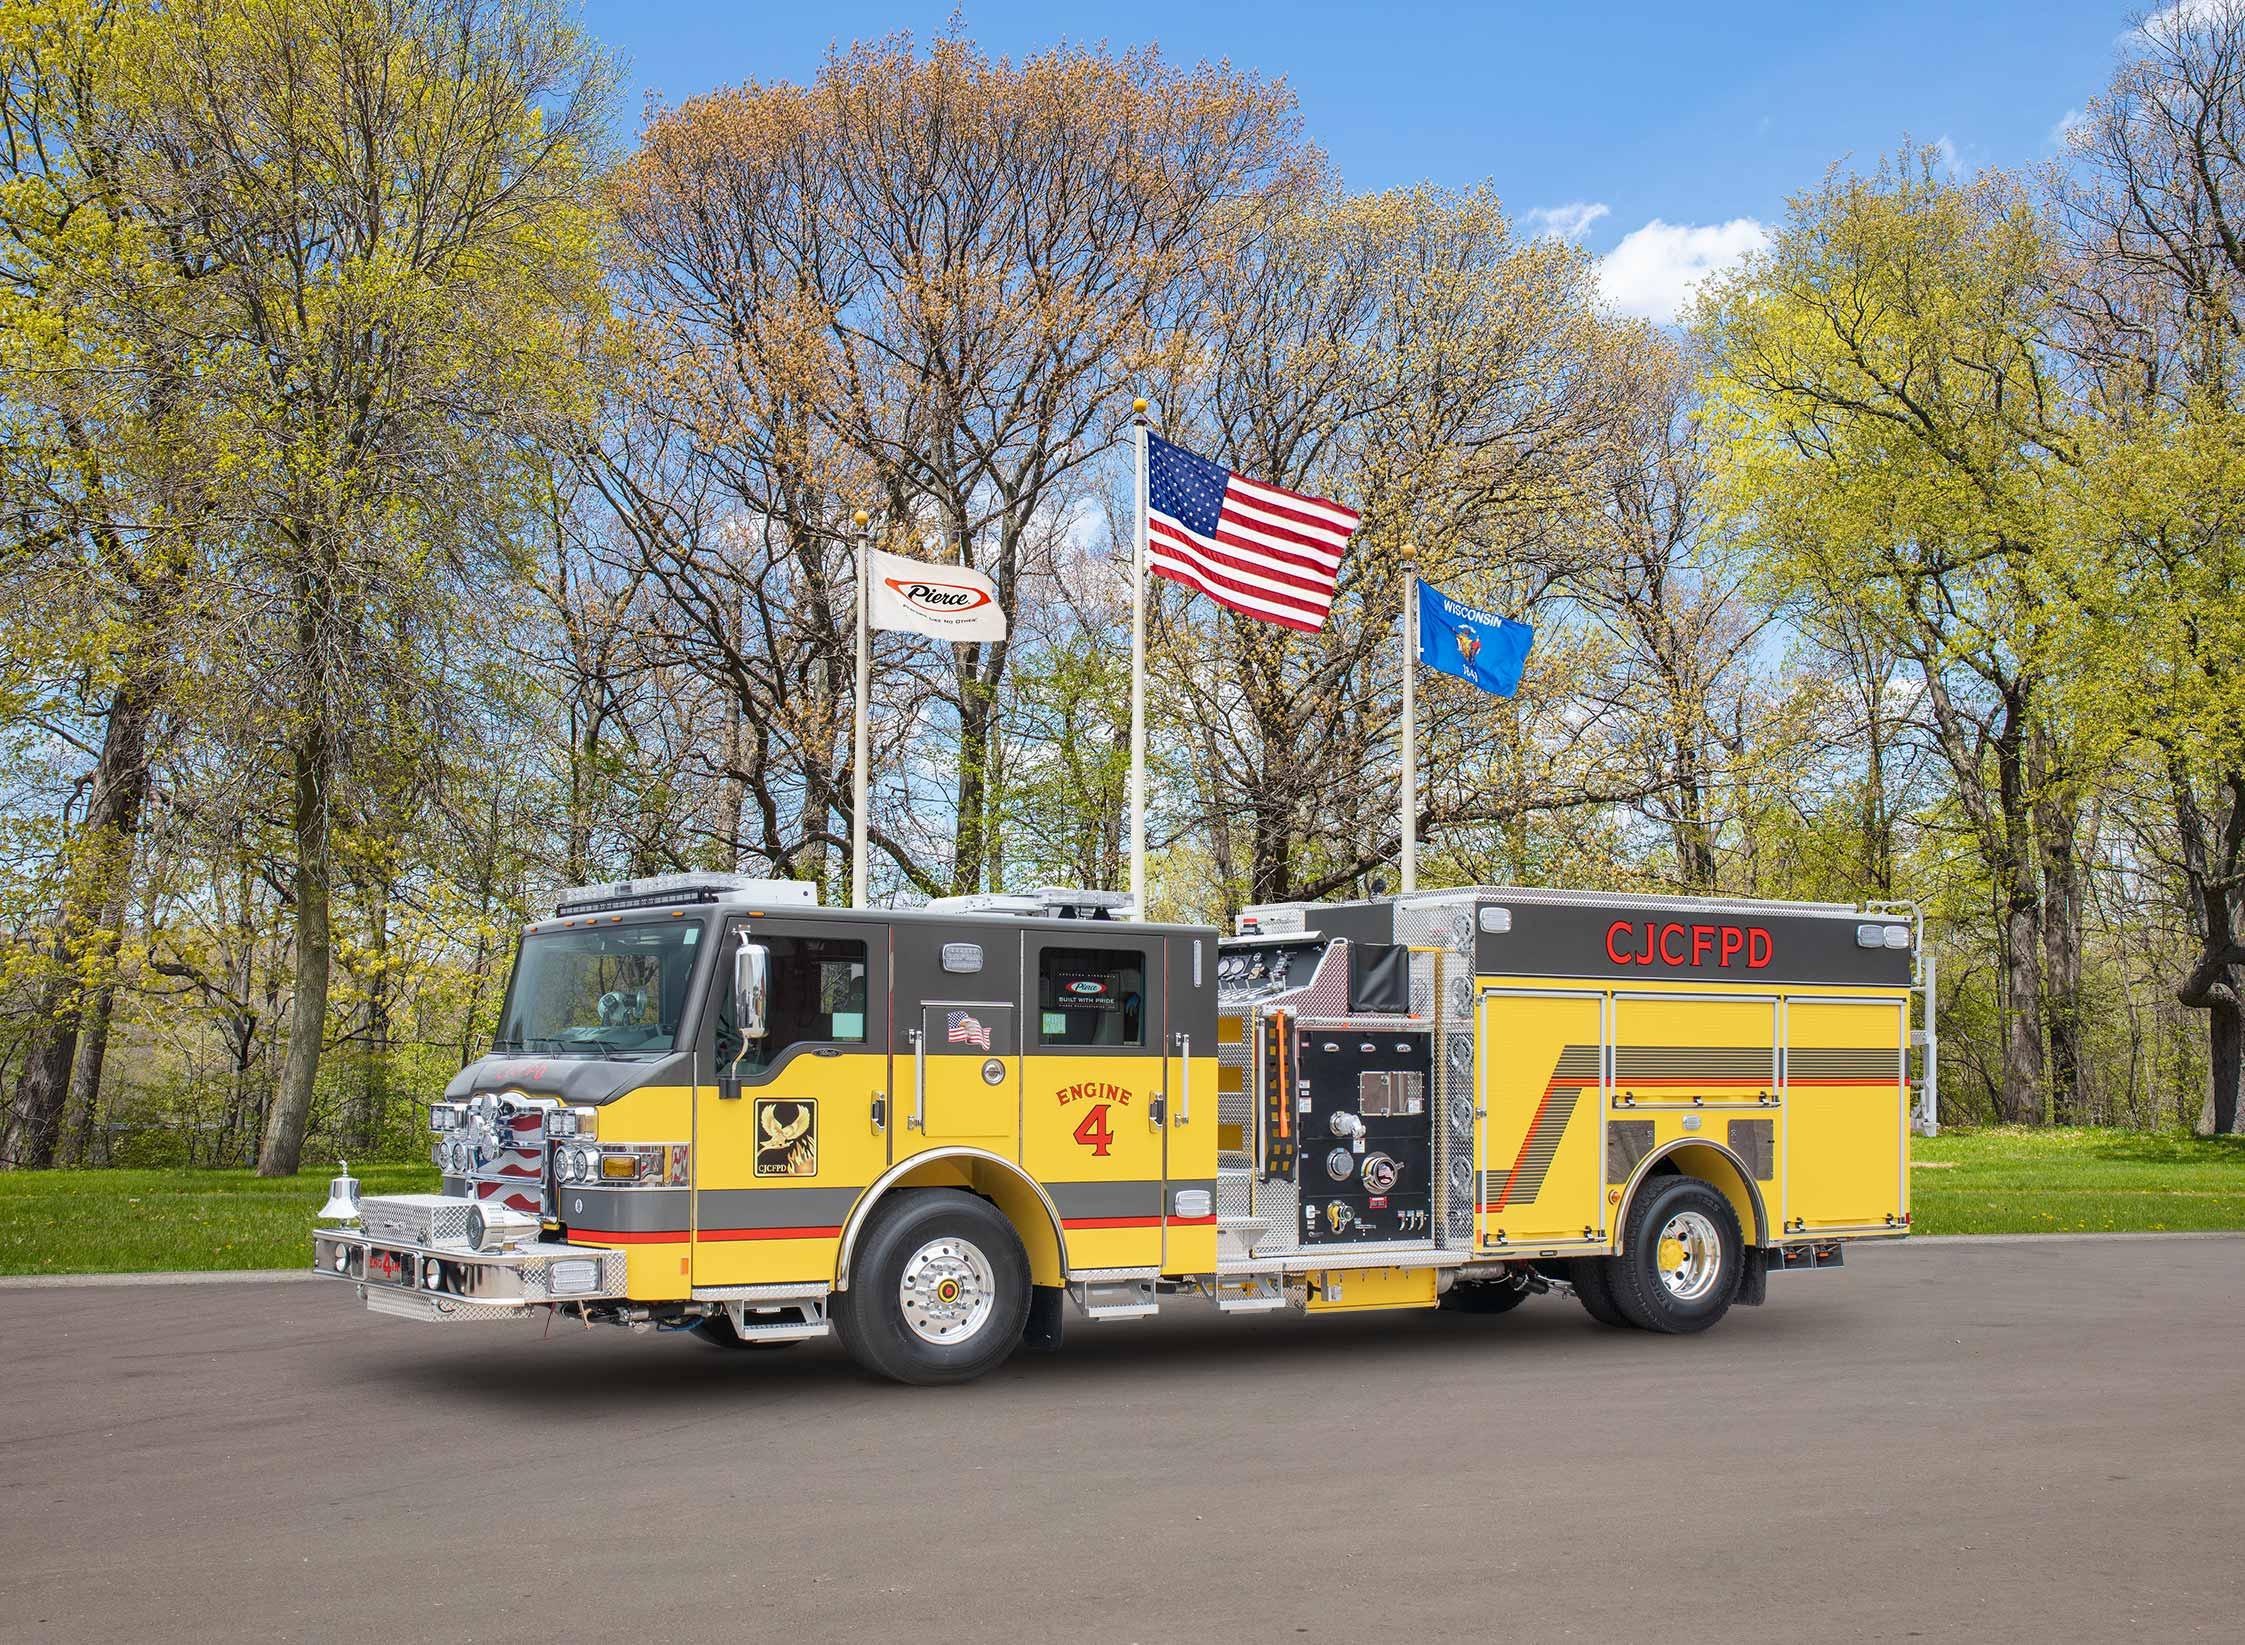 Central Jackson Fire Protection District - Pumper